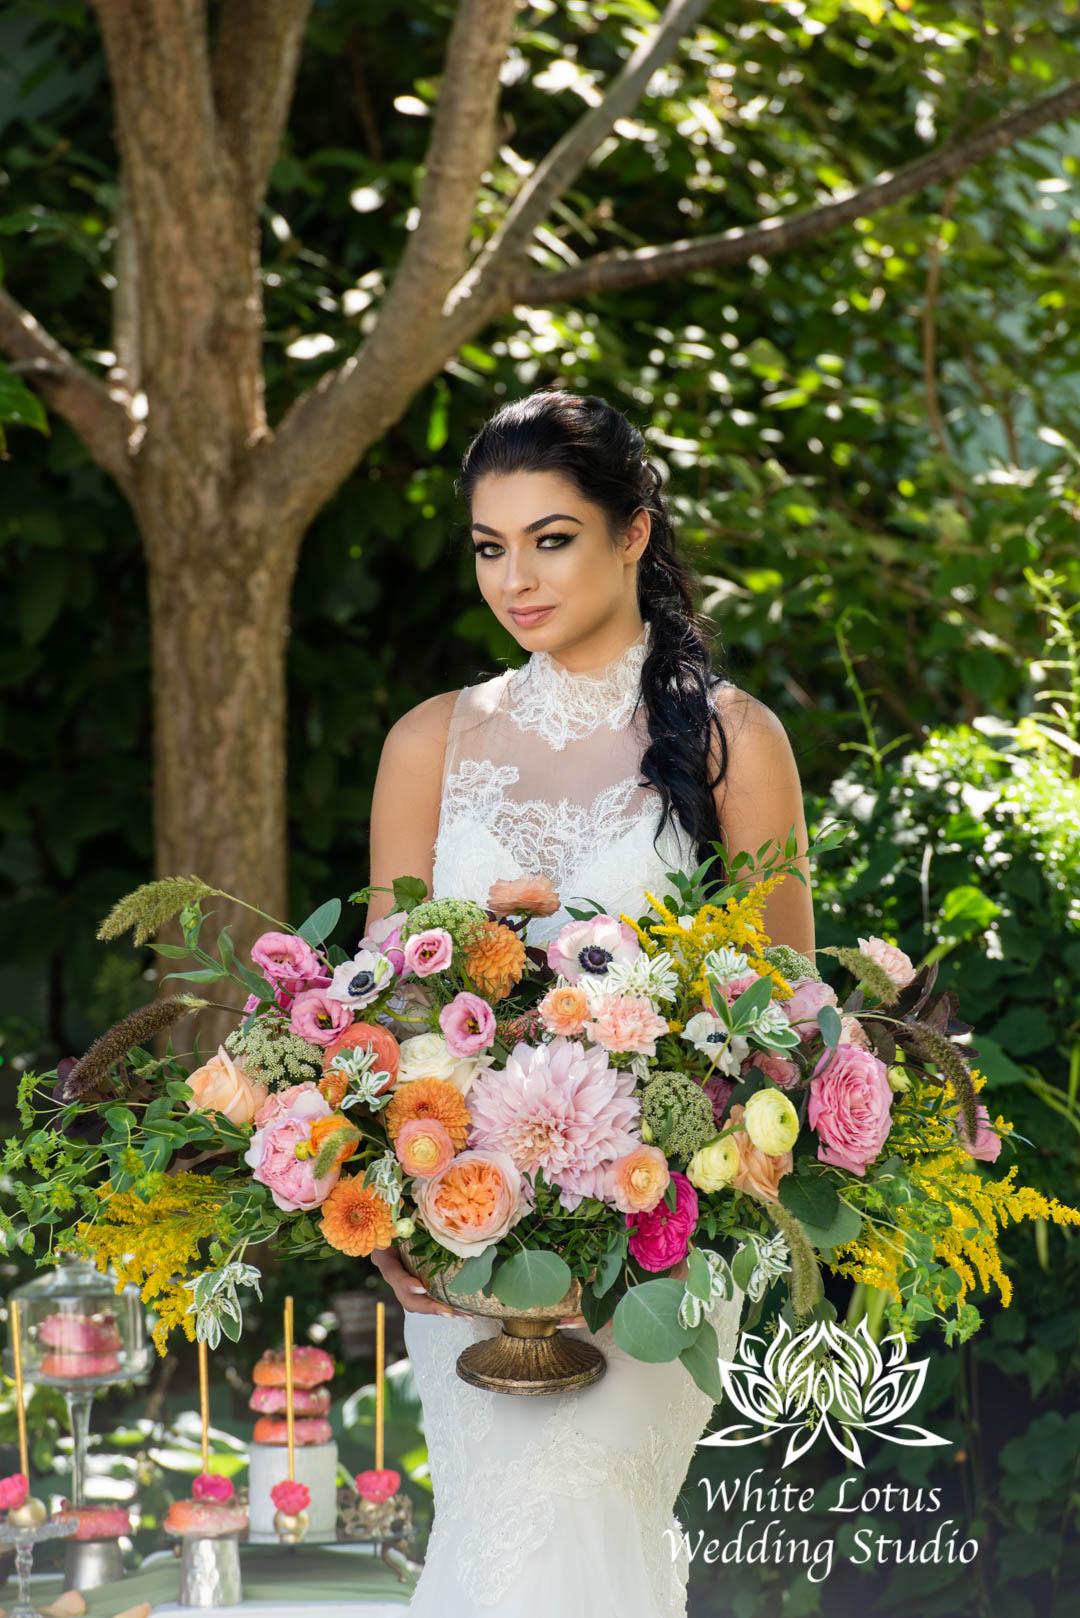 087- SPRING GARDEN WEDDING INSPIRATION